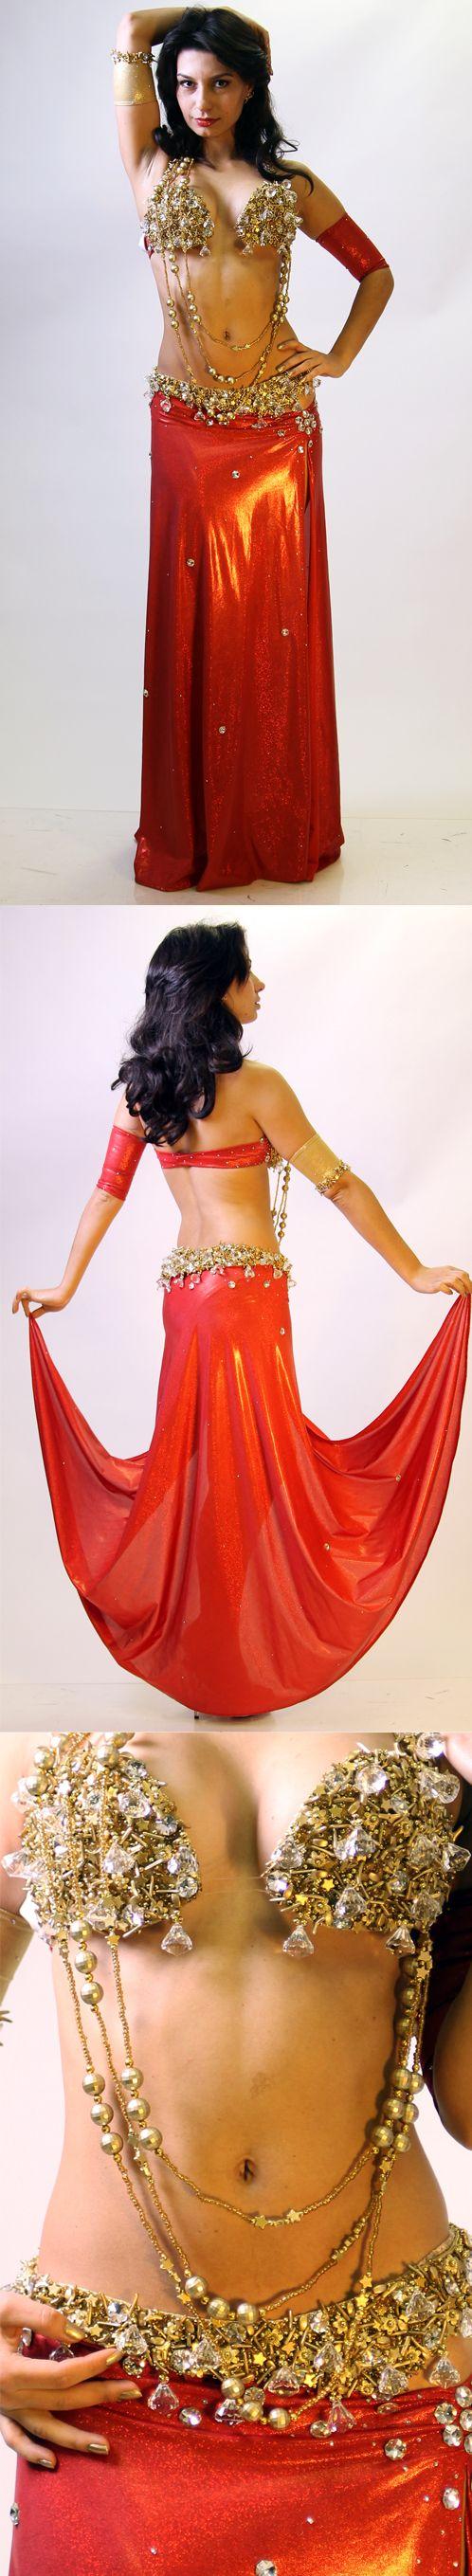 Sahar Okasha Two-Piece Costume (20602)